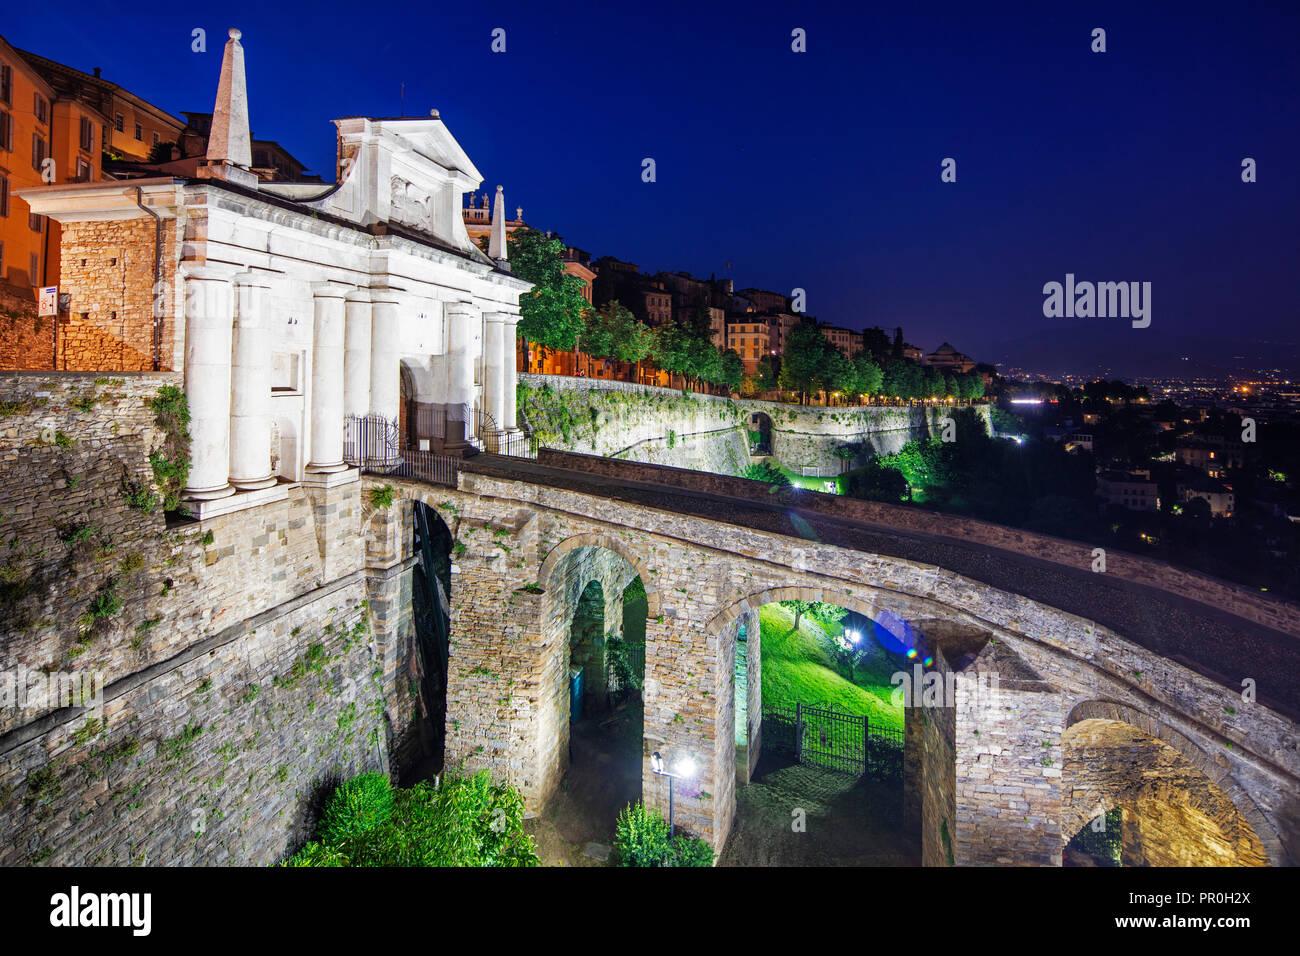 Porta San Giacomo, Upper Town (Citta Alta), Bermago, Lombardy, Italy, Europe - Stock Image